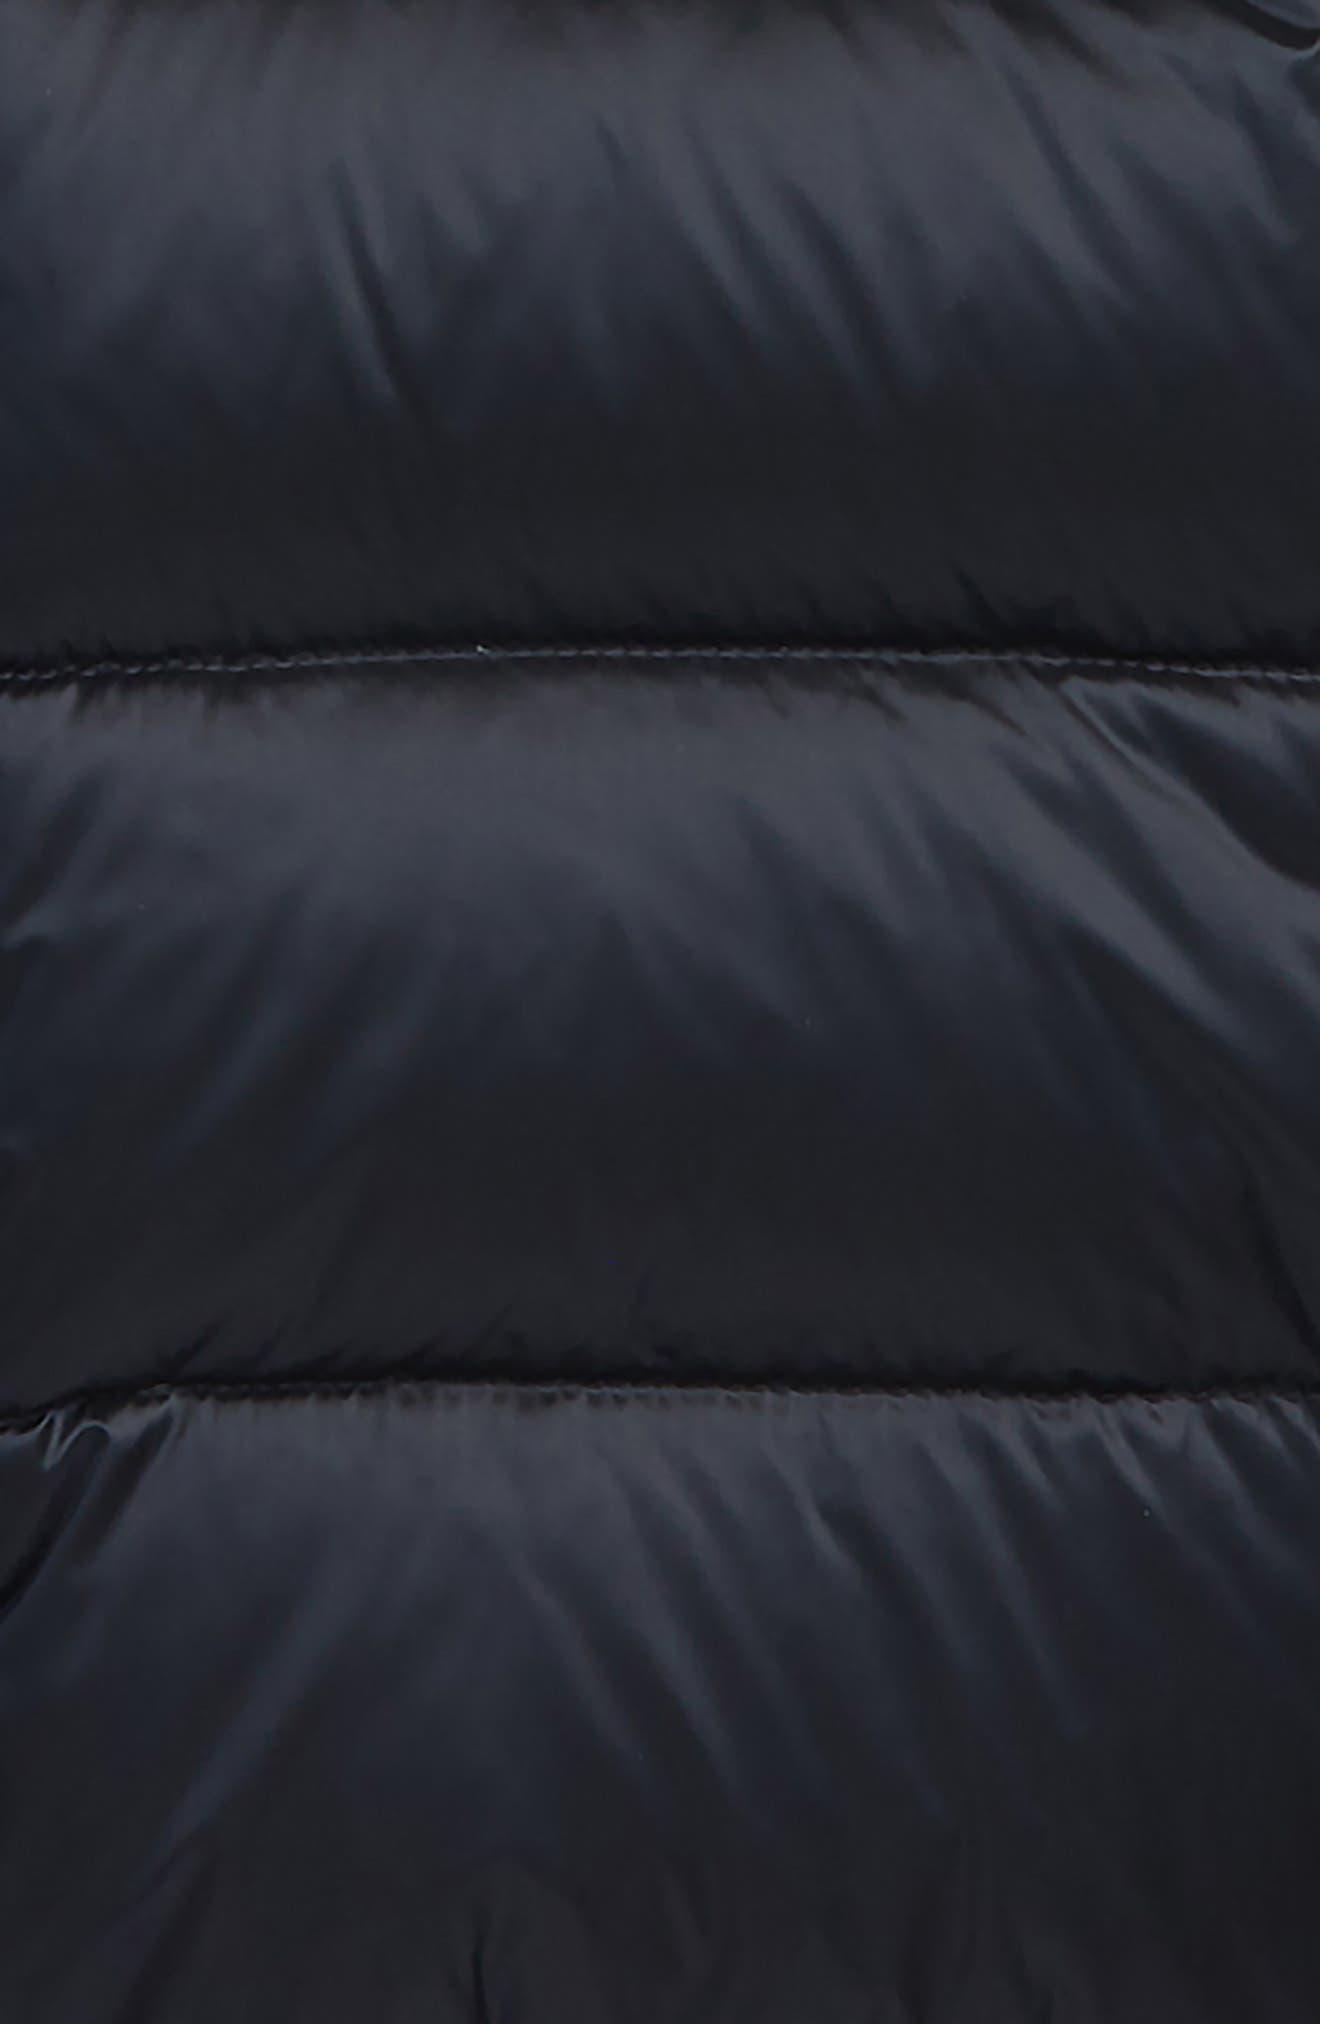 MONCLER,                             Anemonet Ruffle Trim Jacket,                             Alternate thumbnail 2, color,                             NAVY